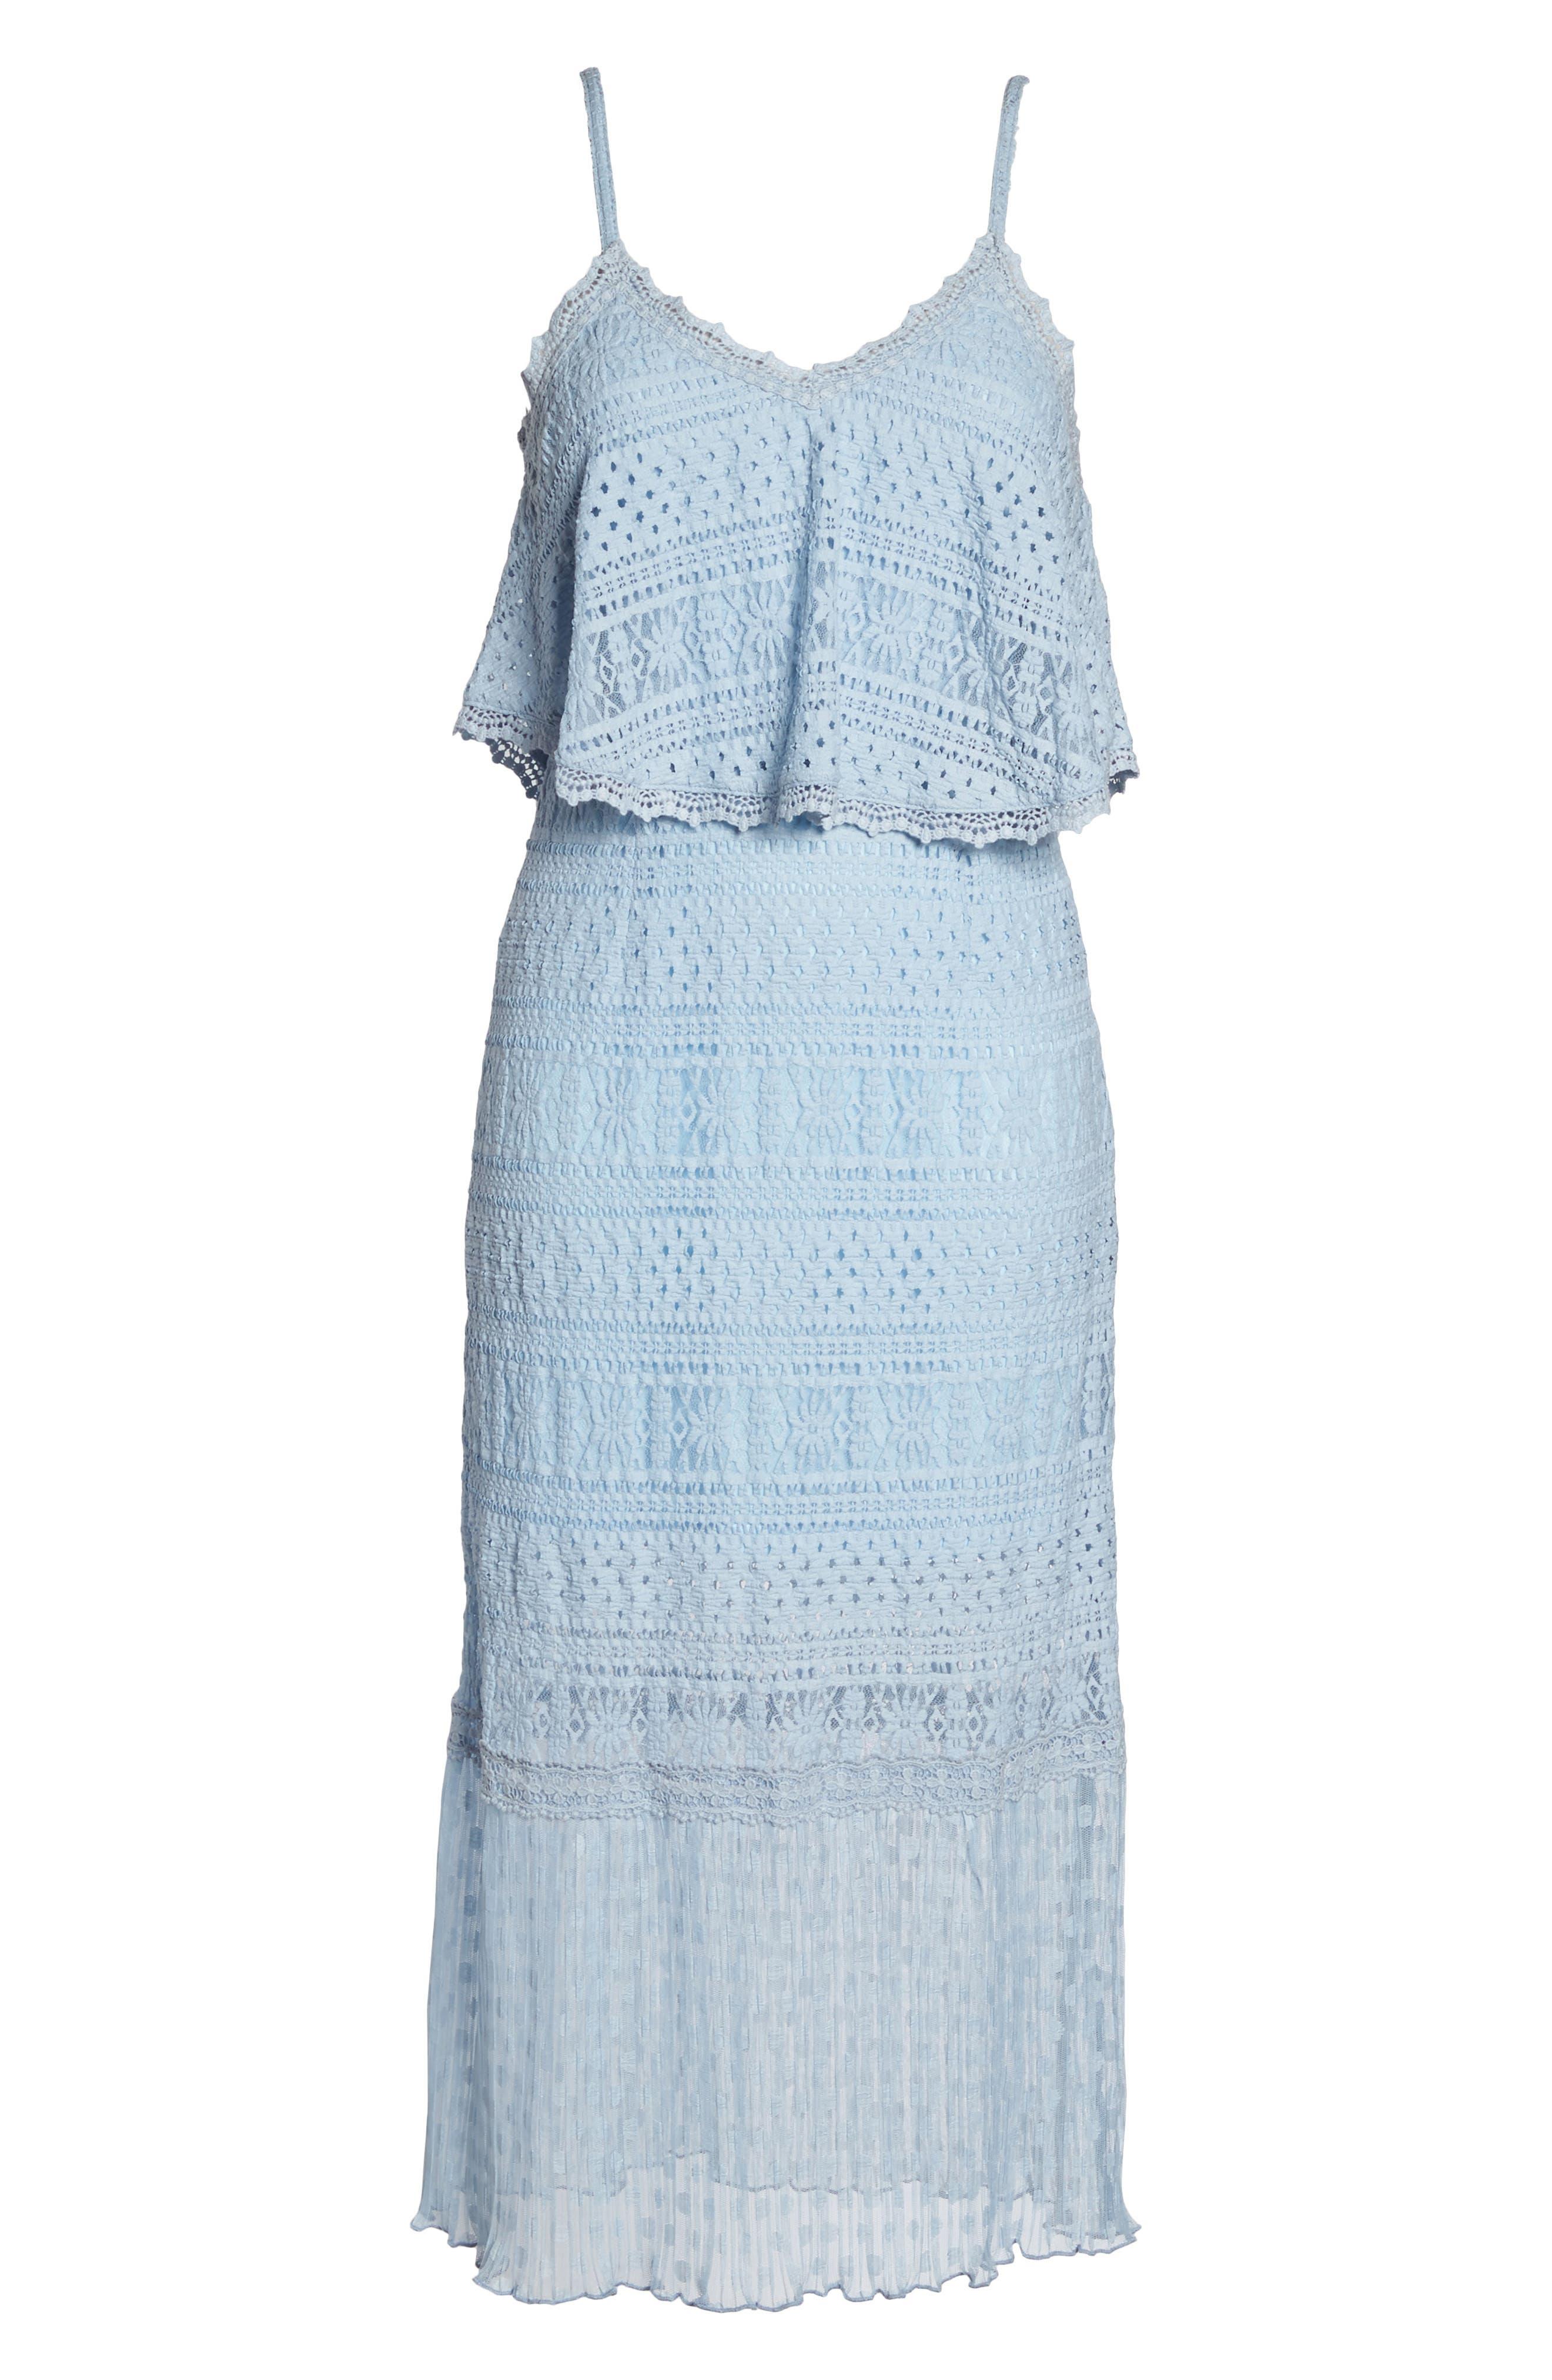 Ellie Lace Popover Midi Dress,                             Alternate thumbnail 6, color,                             Celestial Blue